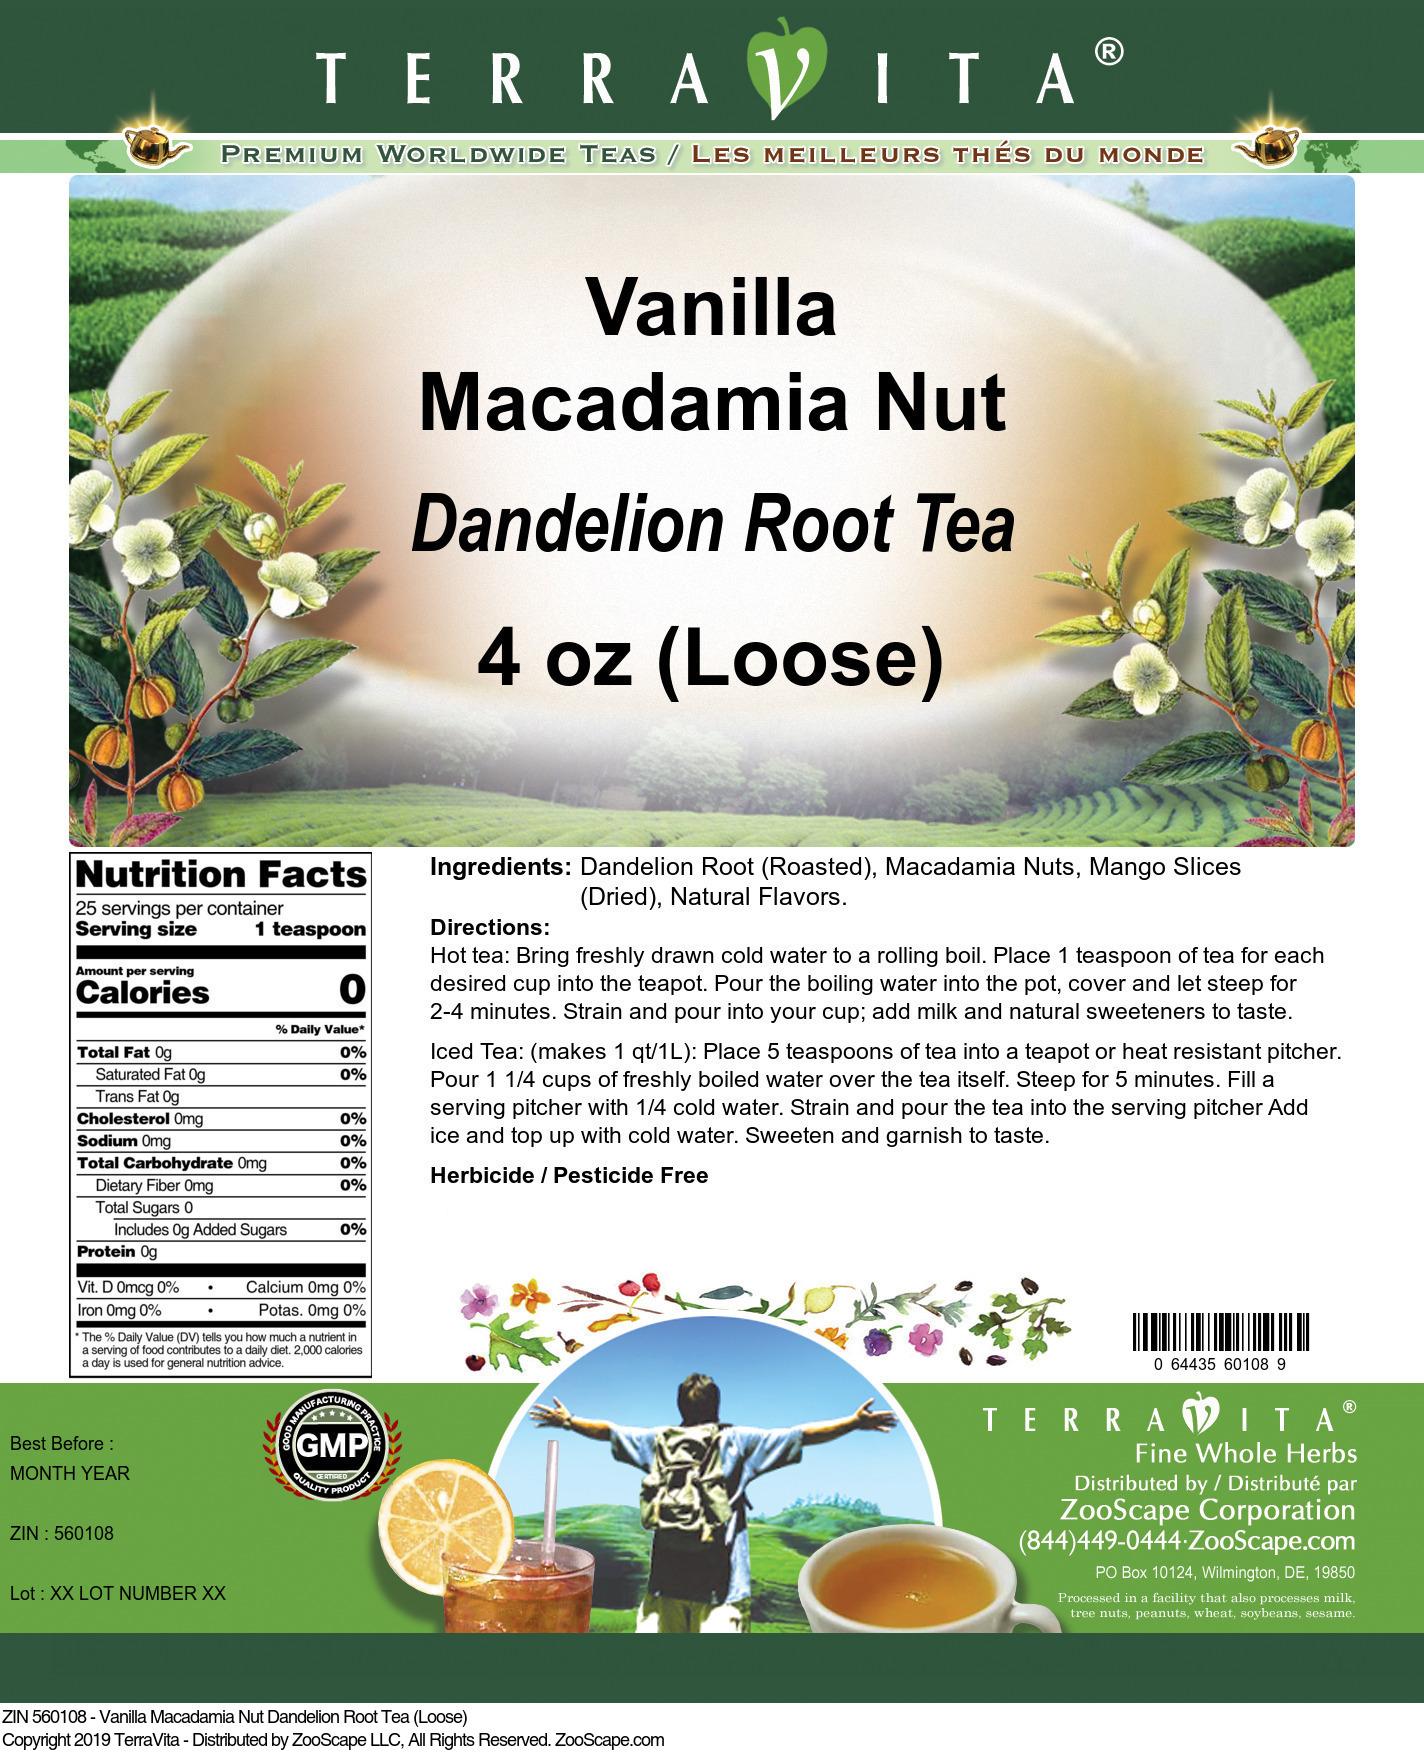 Vanilla Macadamia Nut Dandelion Root